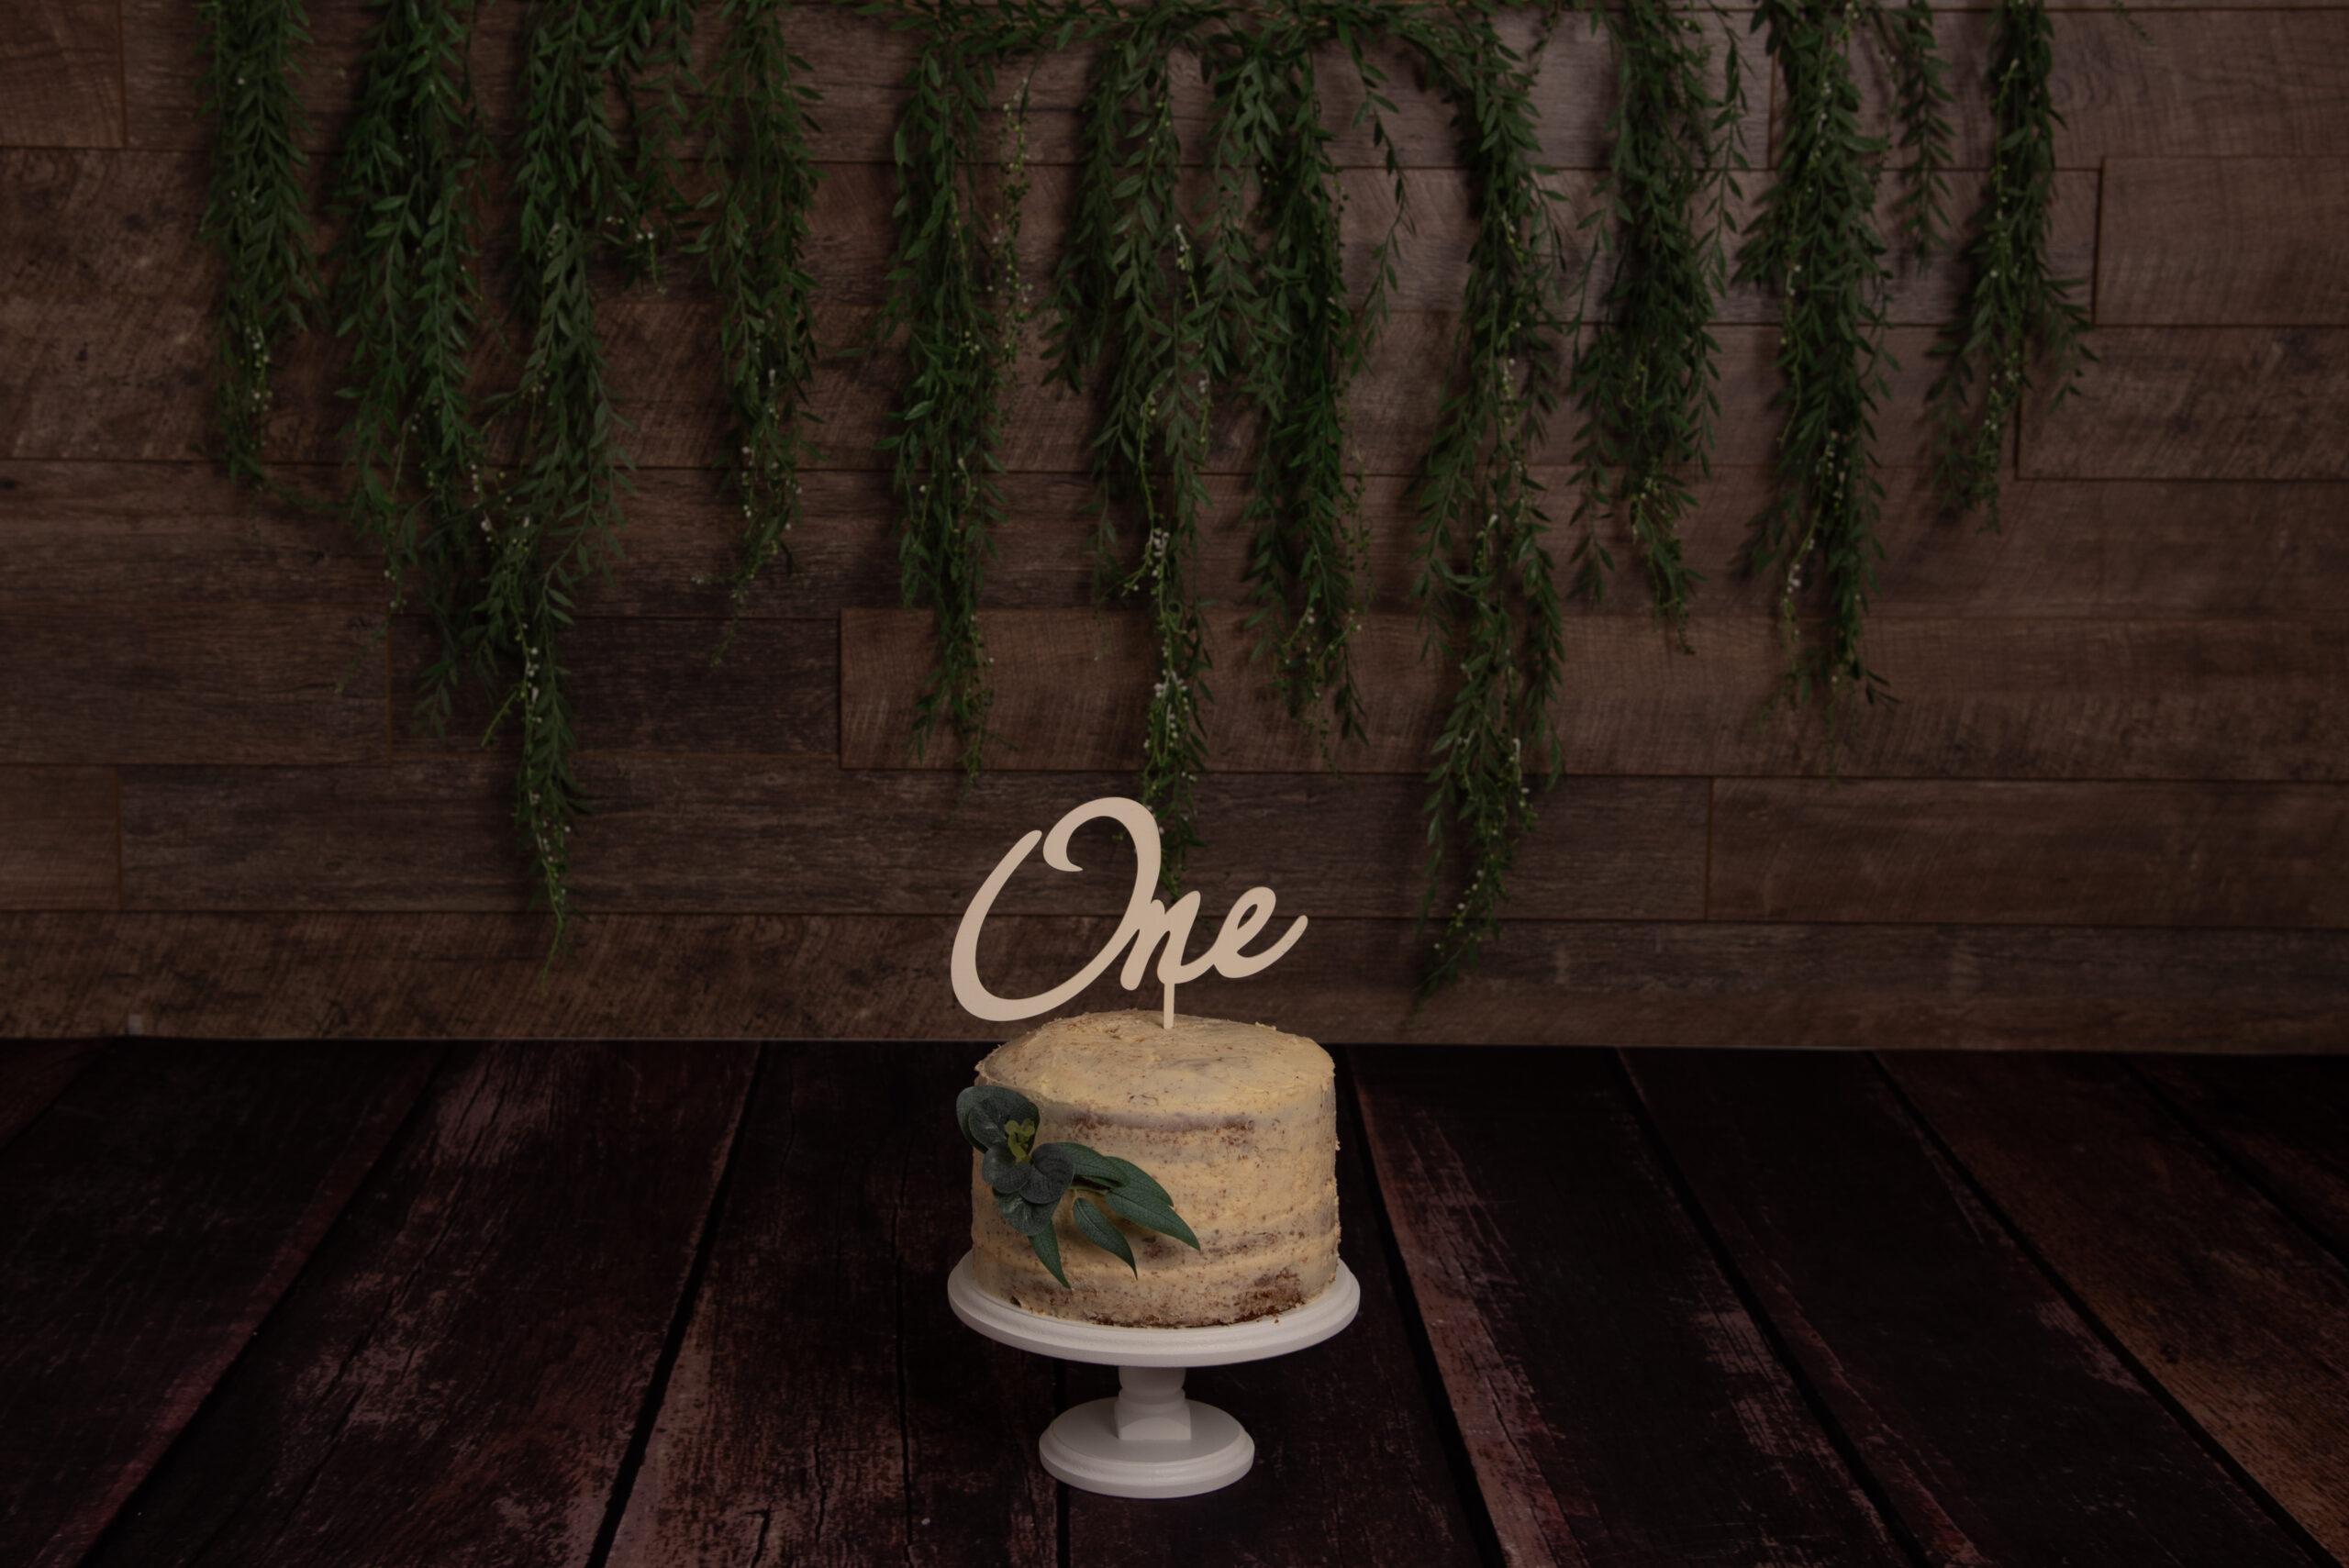 promo cake photos